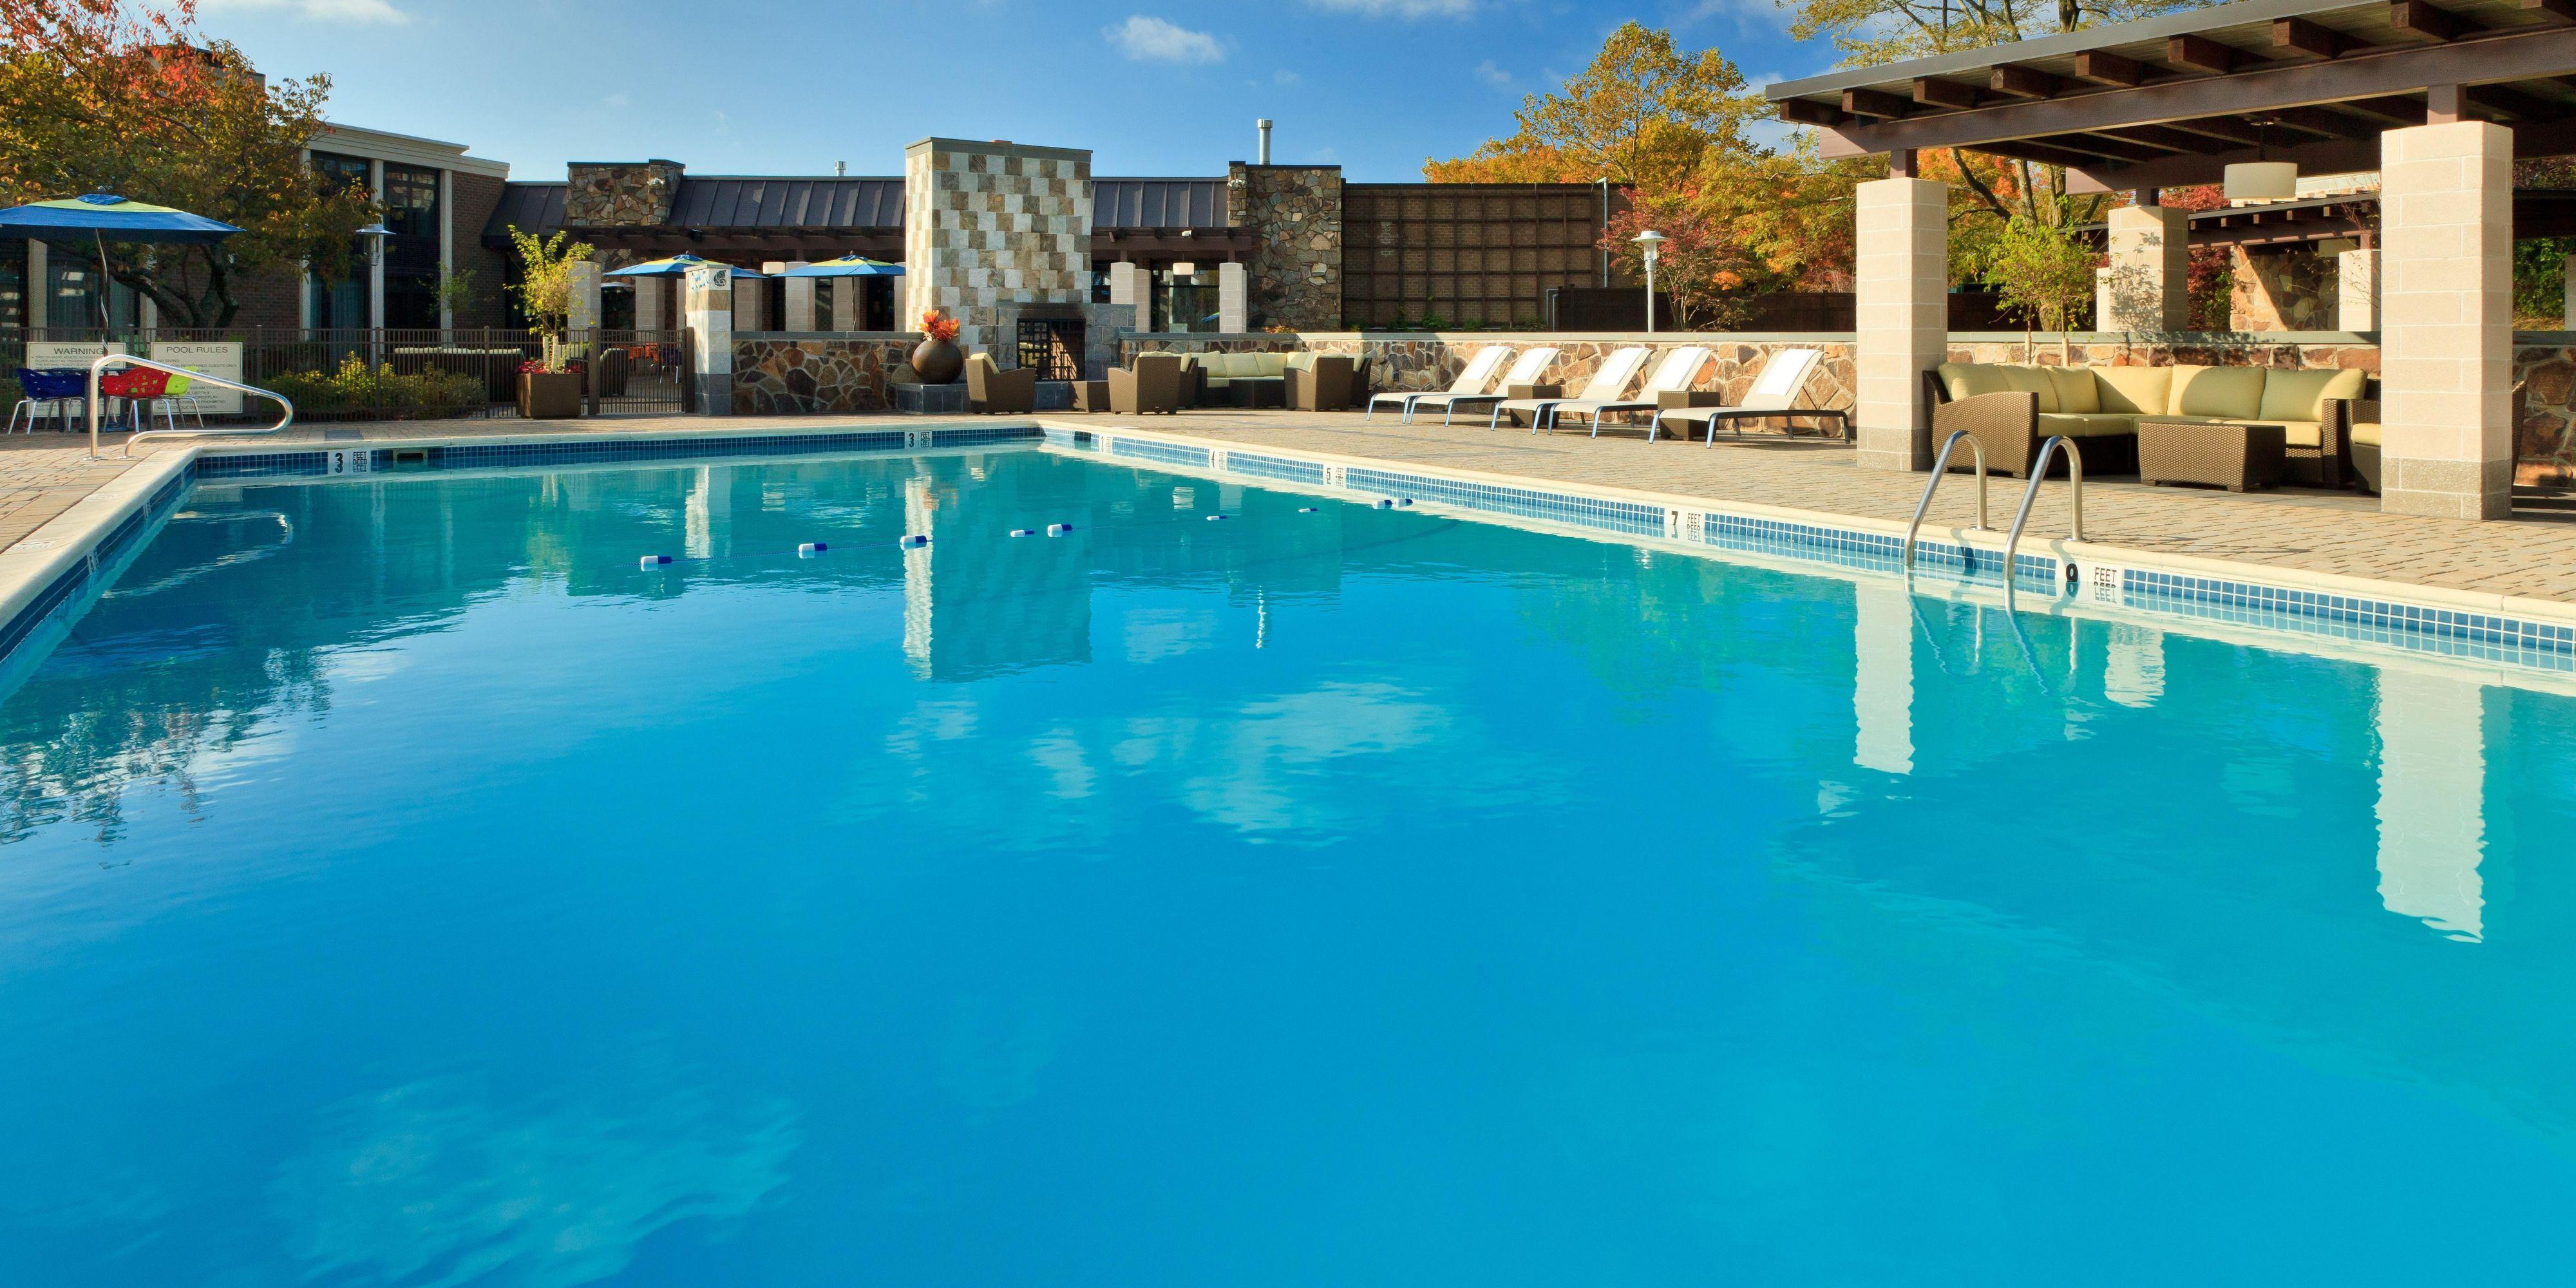 Hotel Indigo Long Island - East End image 2